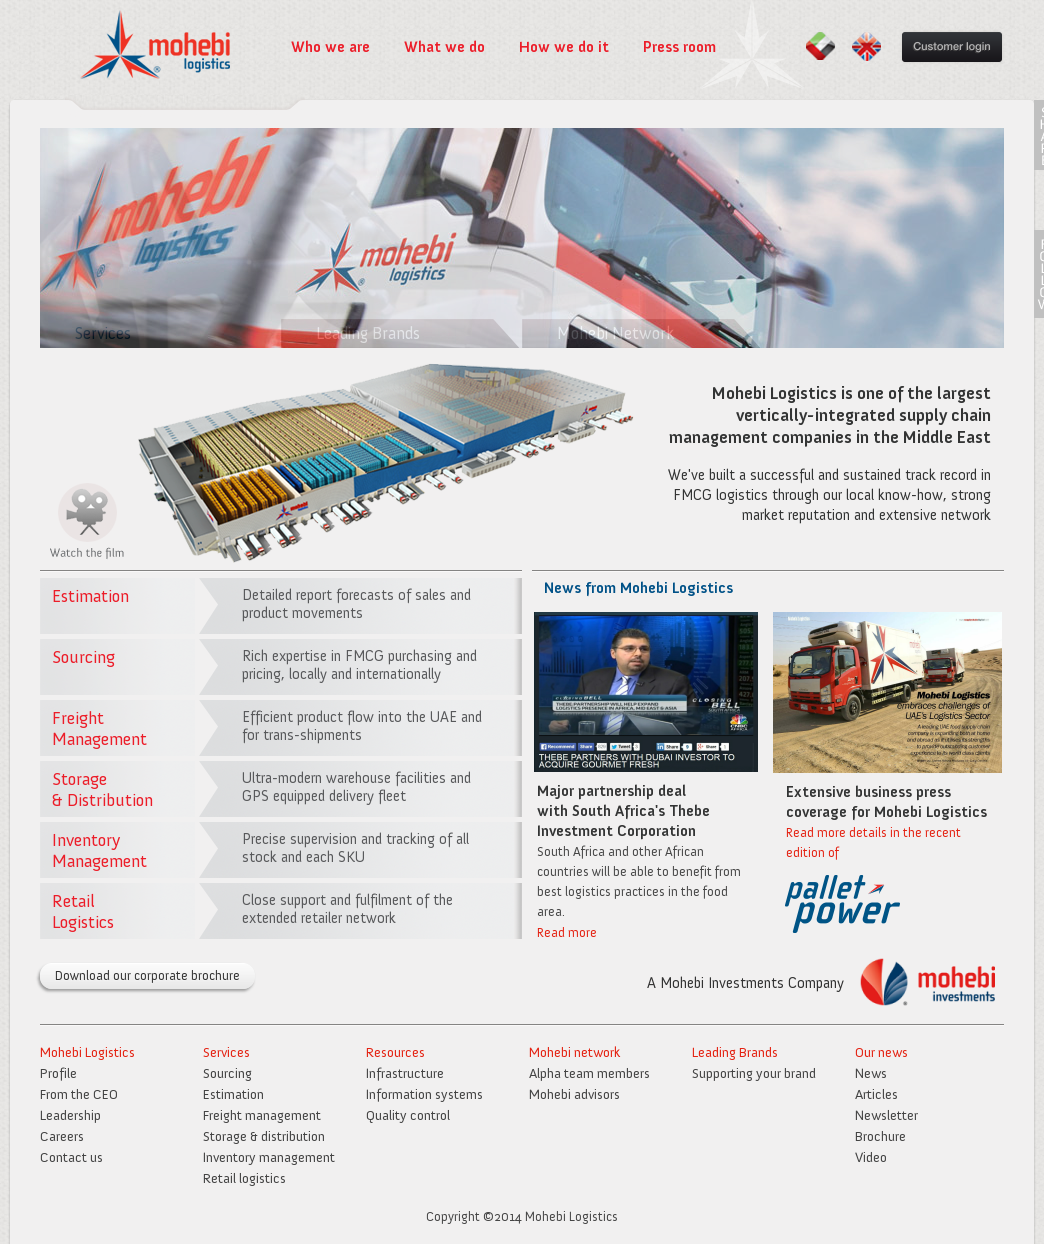 Mohebi Logistics Competitors, Revenue and Employees - Owler